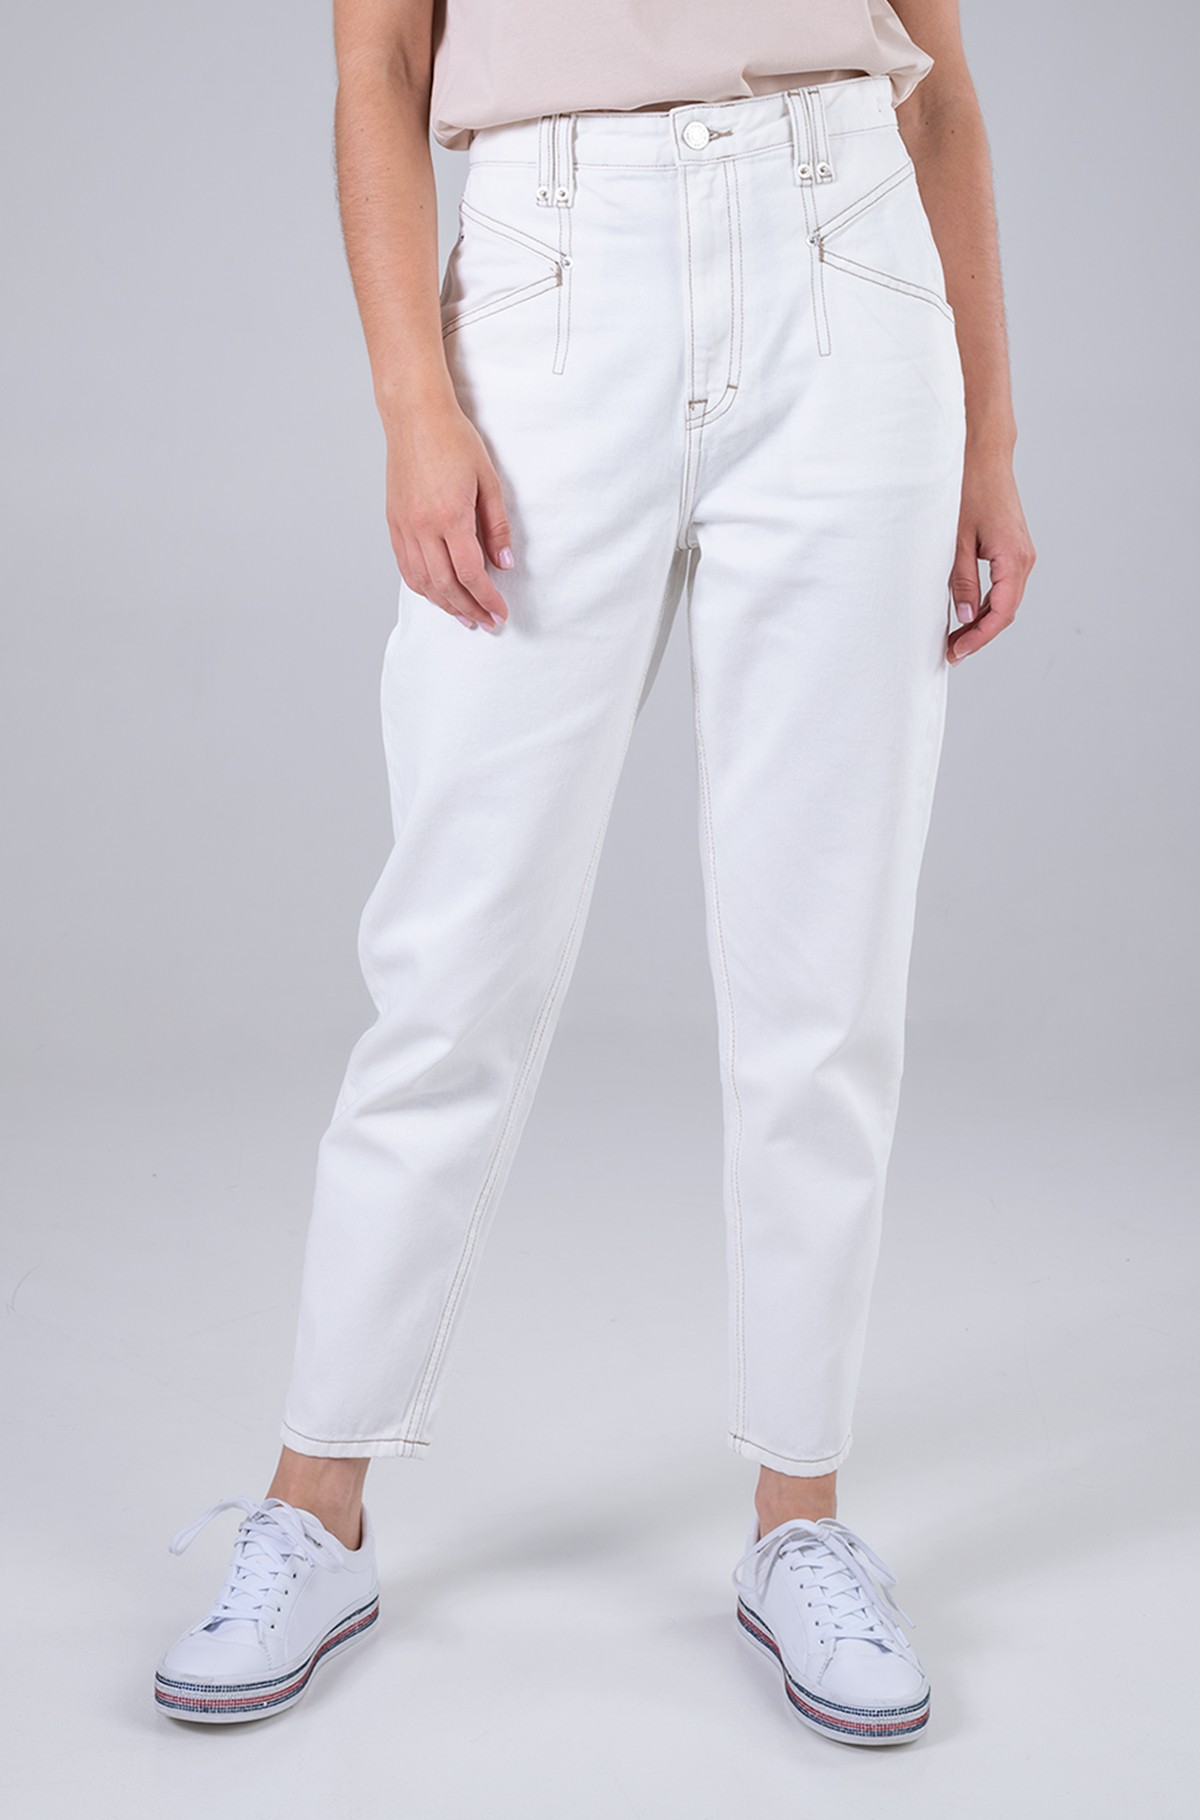 Jeans MOM JEAN KP UHR TPRD AE795 SWR-full-1